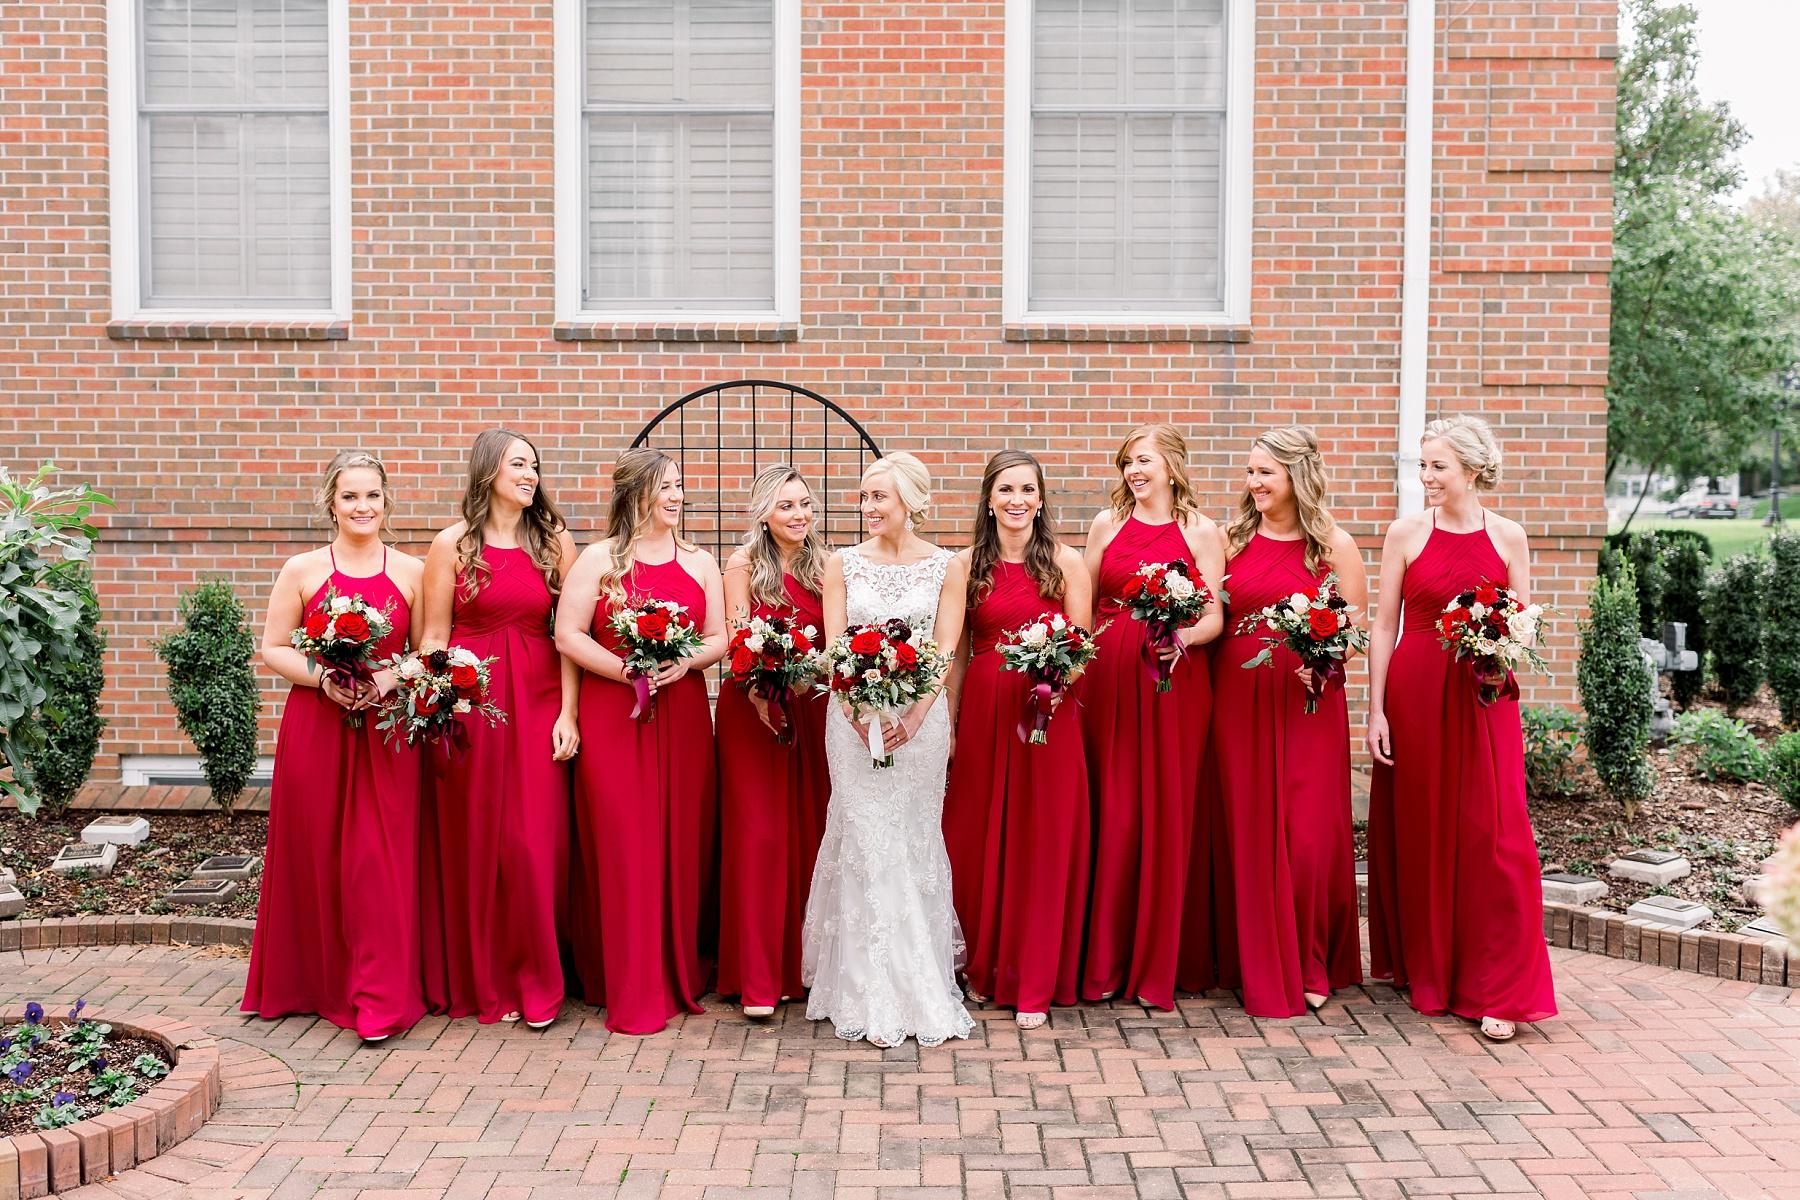 midwest-adventurous-wedding-photographer-elizabeth-ladean-photography-photo_4822.jpg